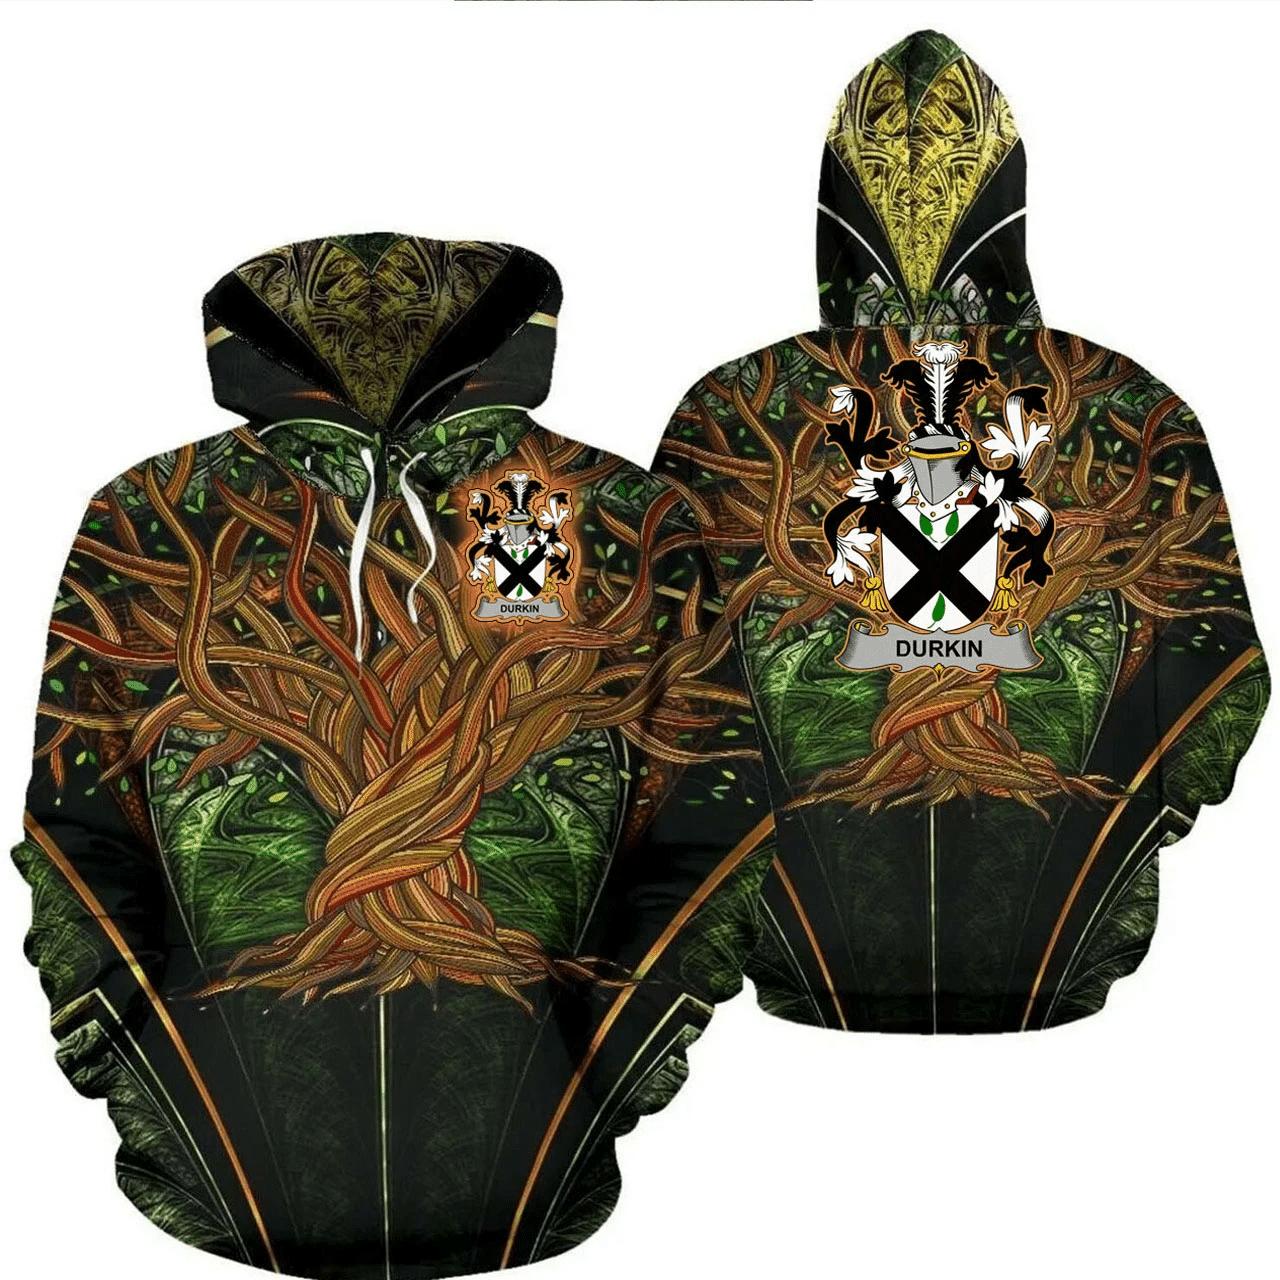 1stIreland Ireland Hoodie - Durkin or O'Durkin Irish Family Crest Hoodie - Tree Of Life A7